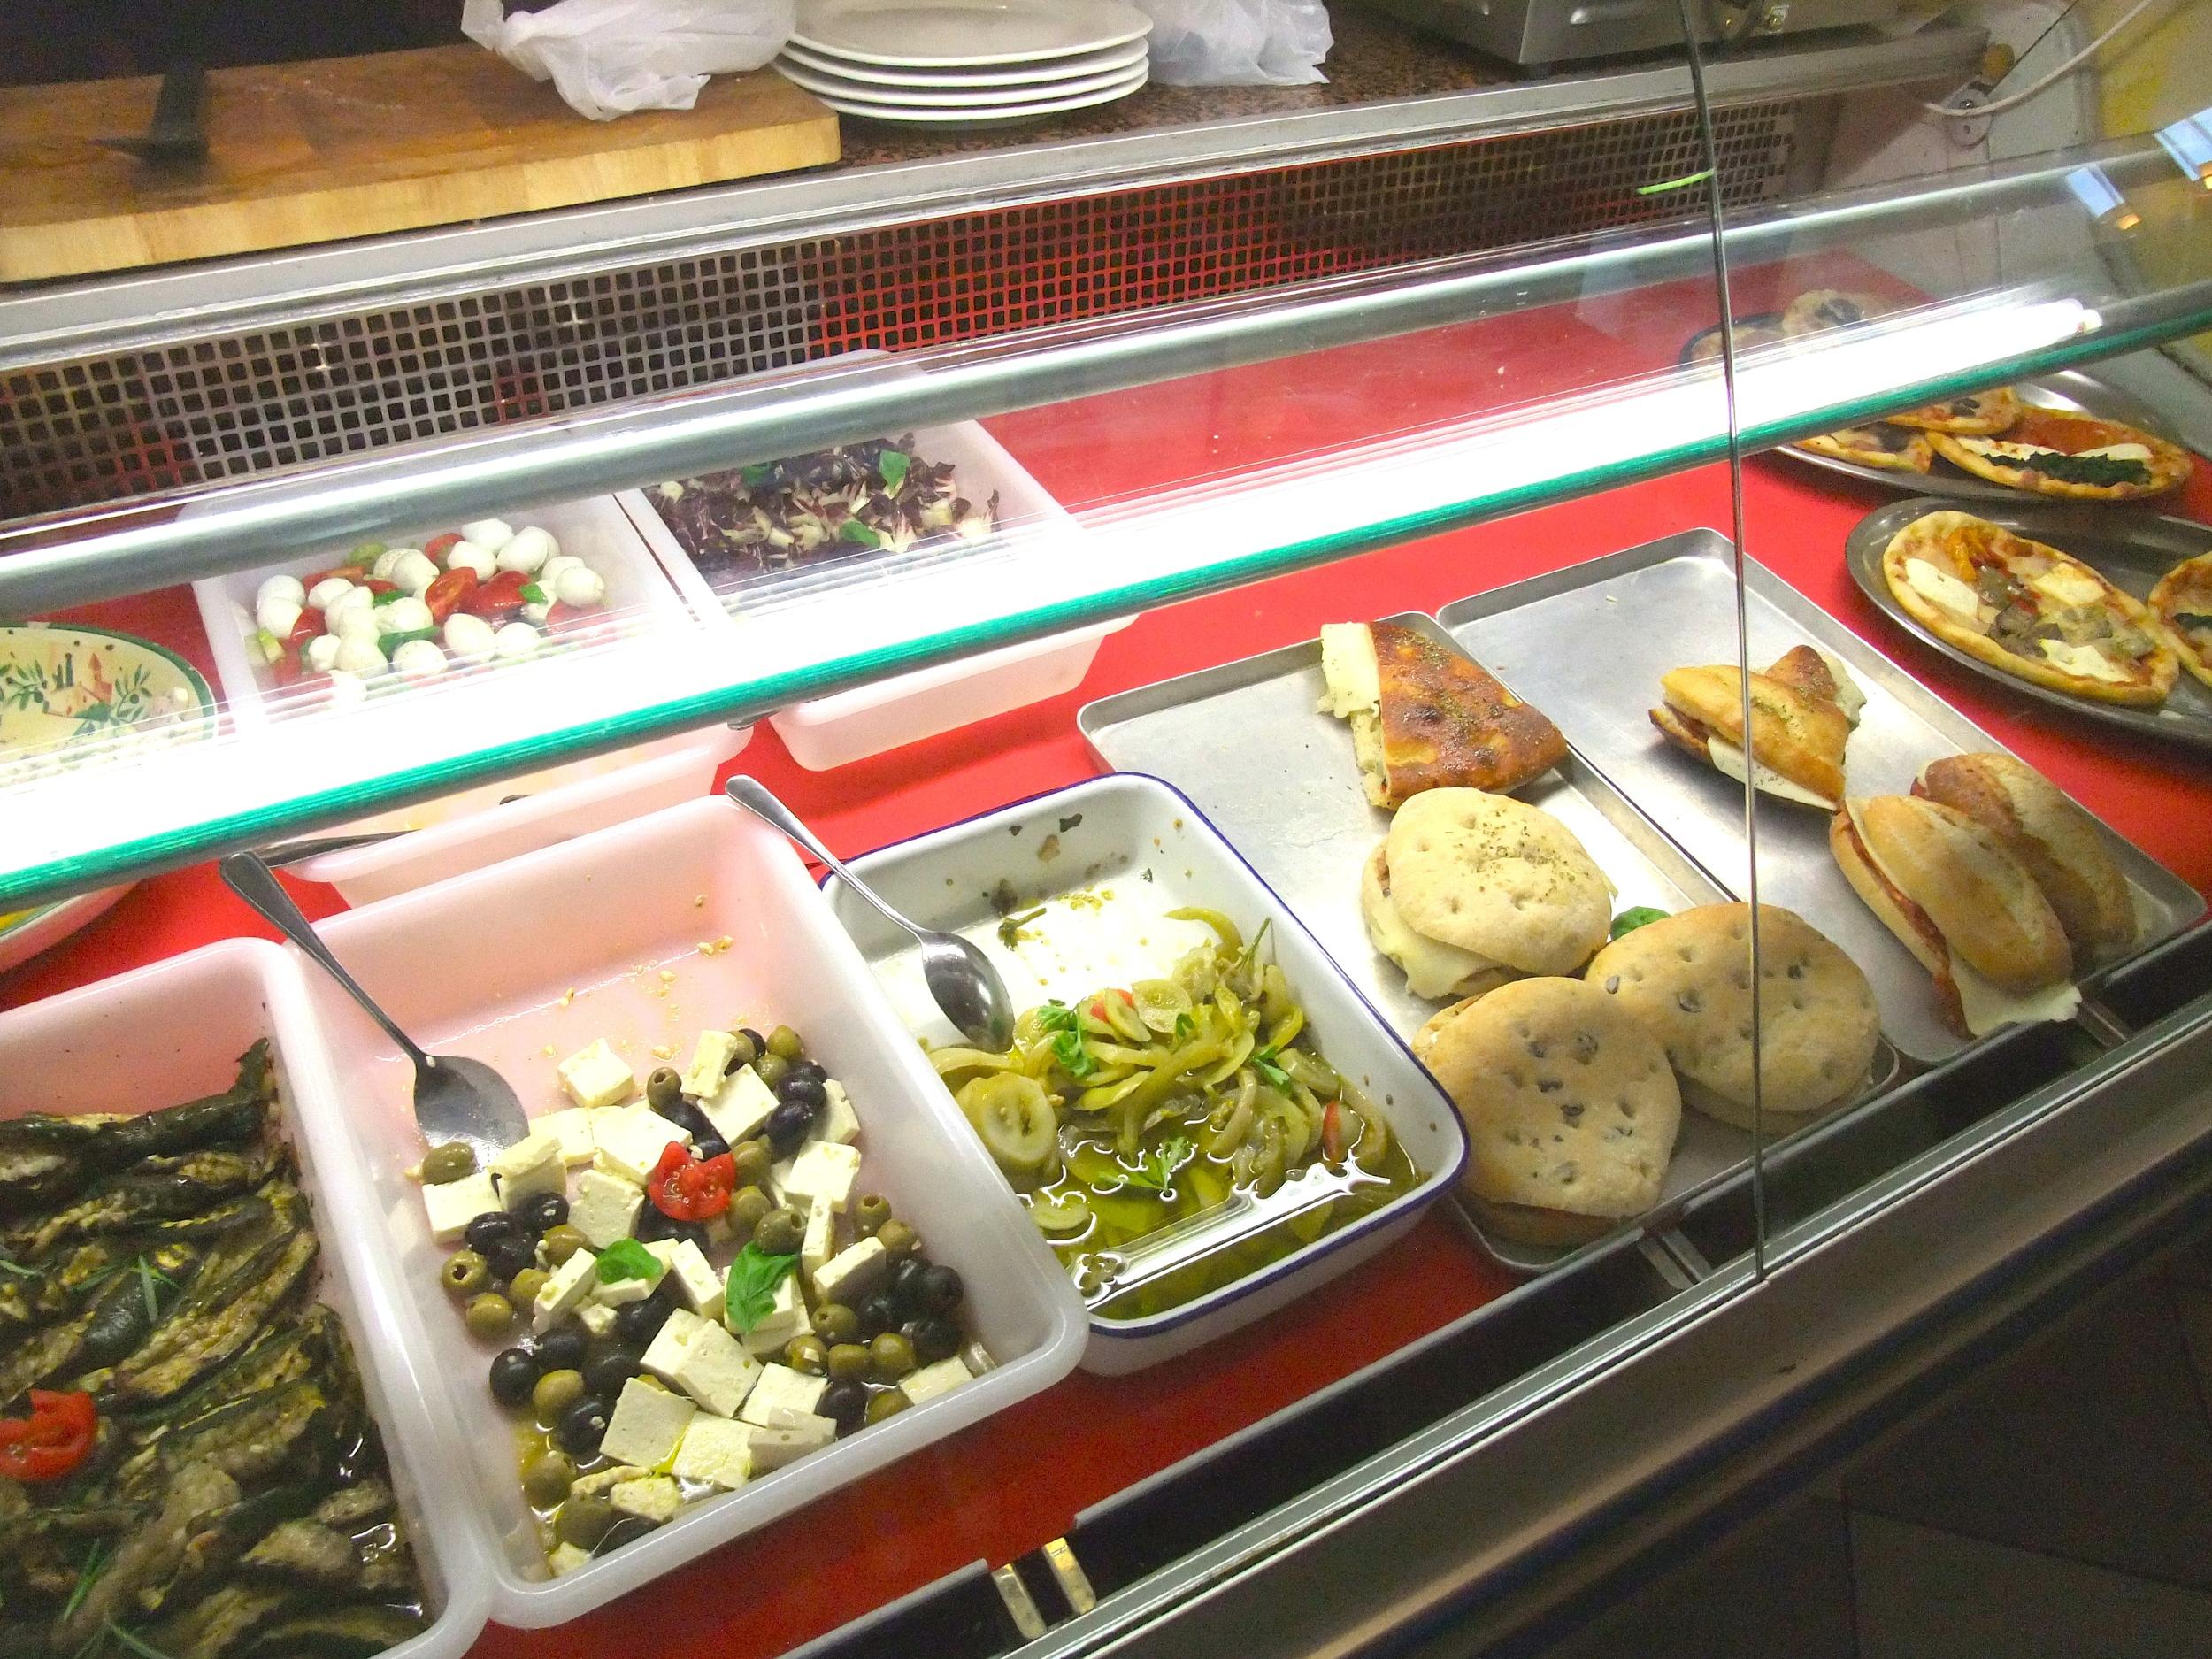 The food case inside Divino